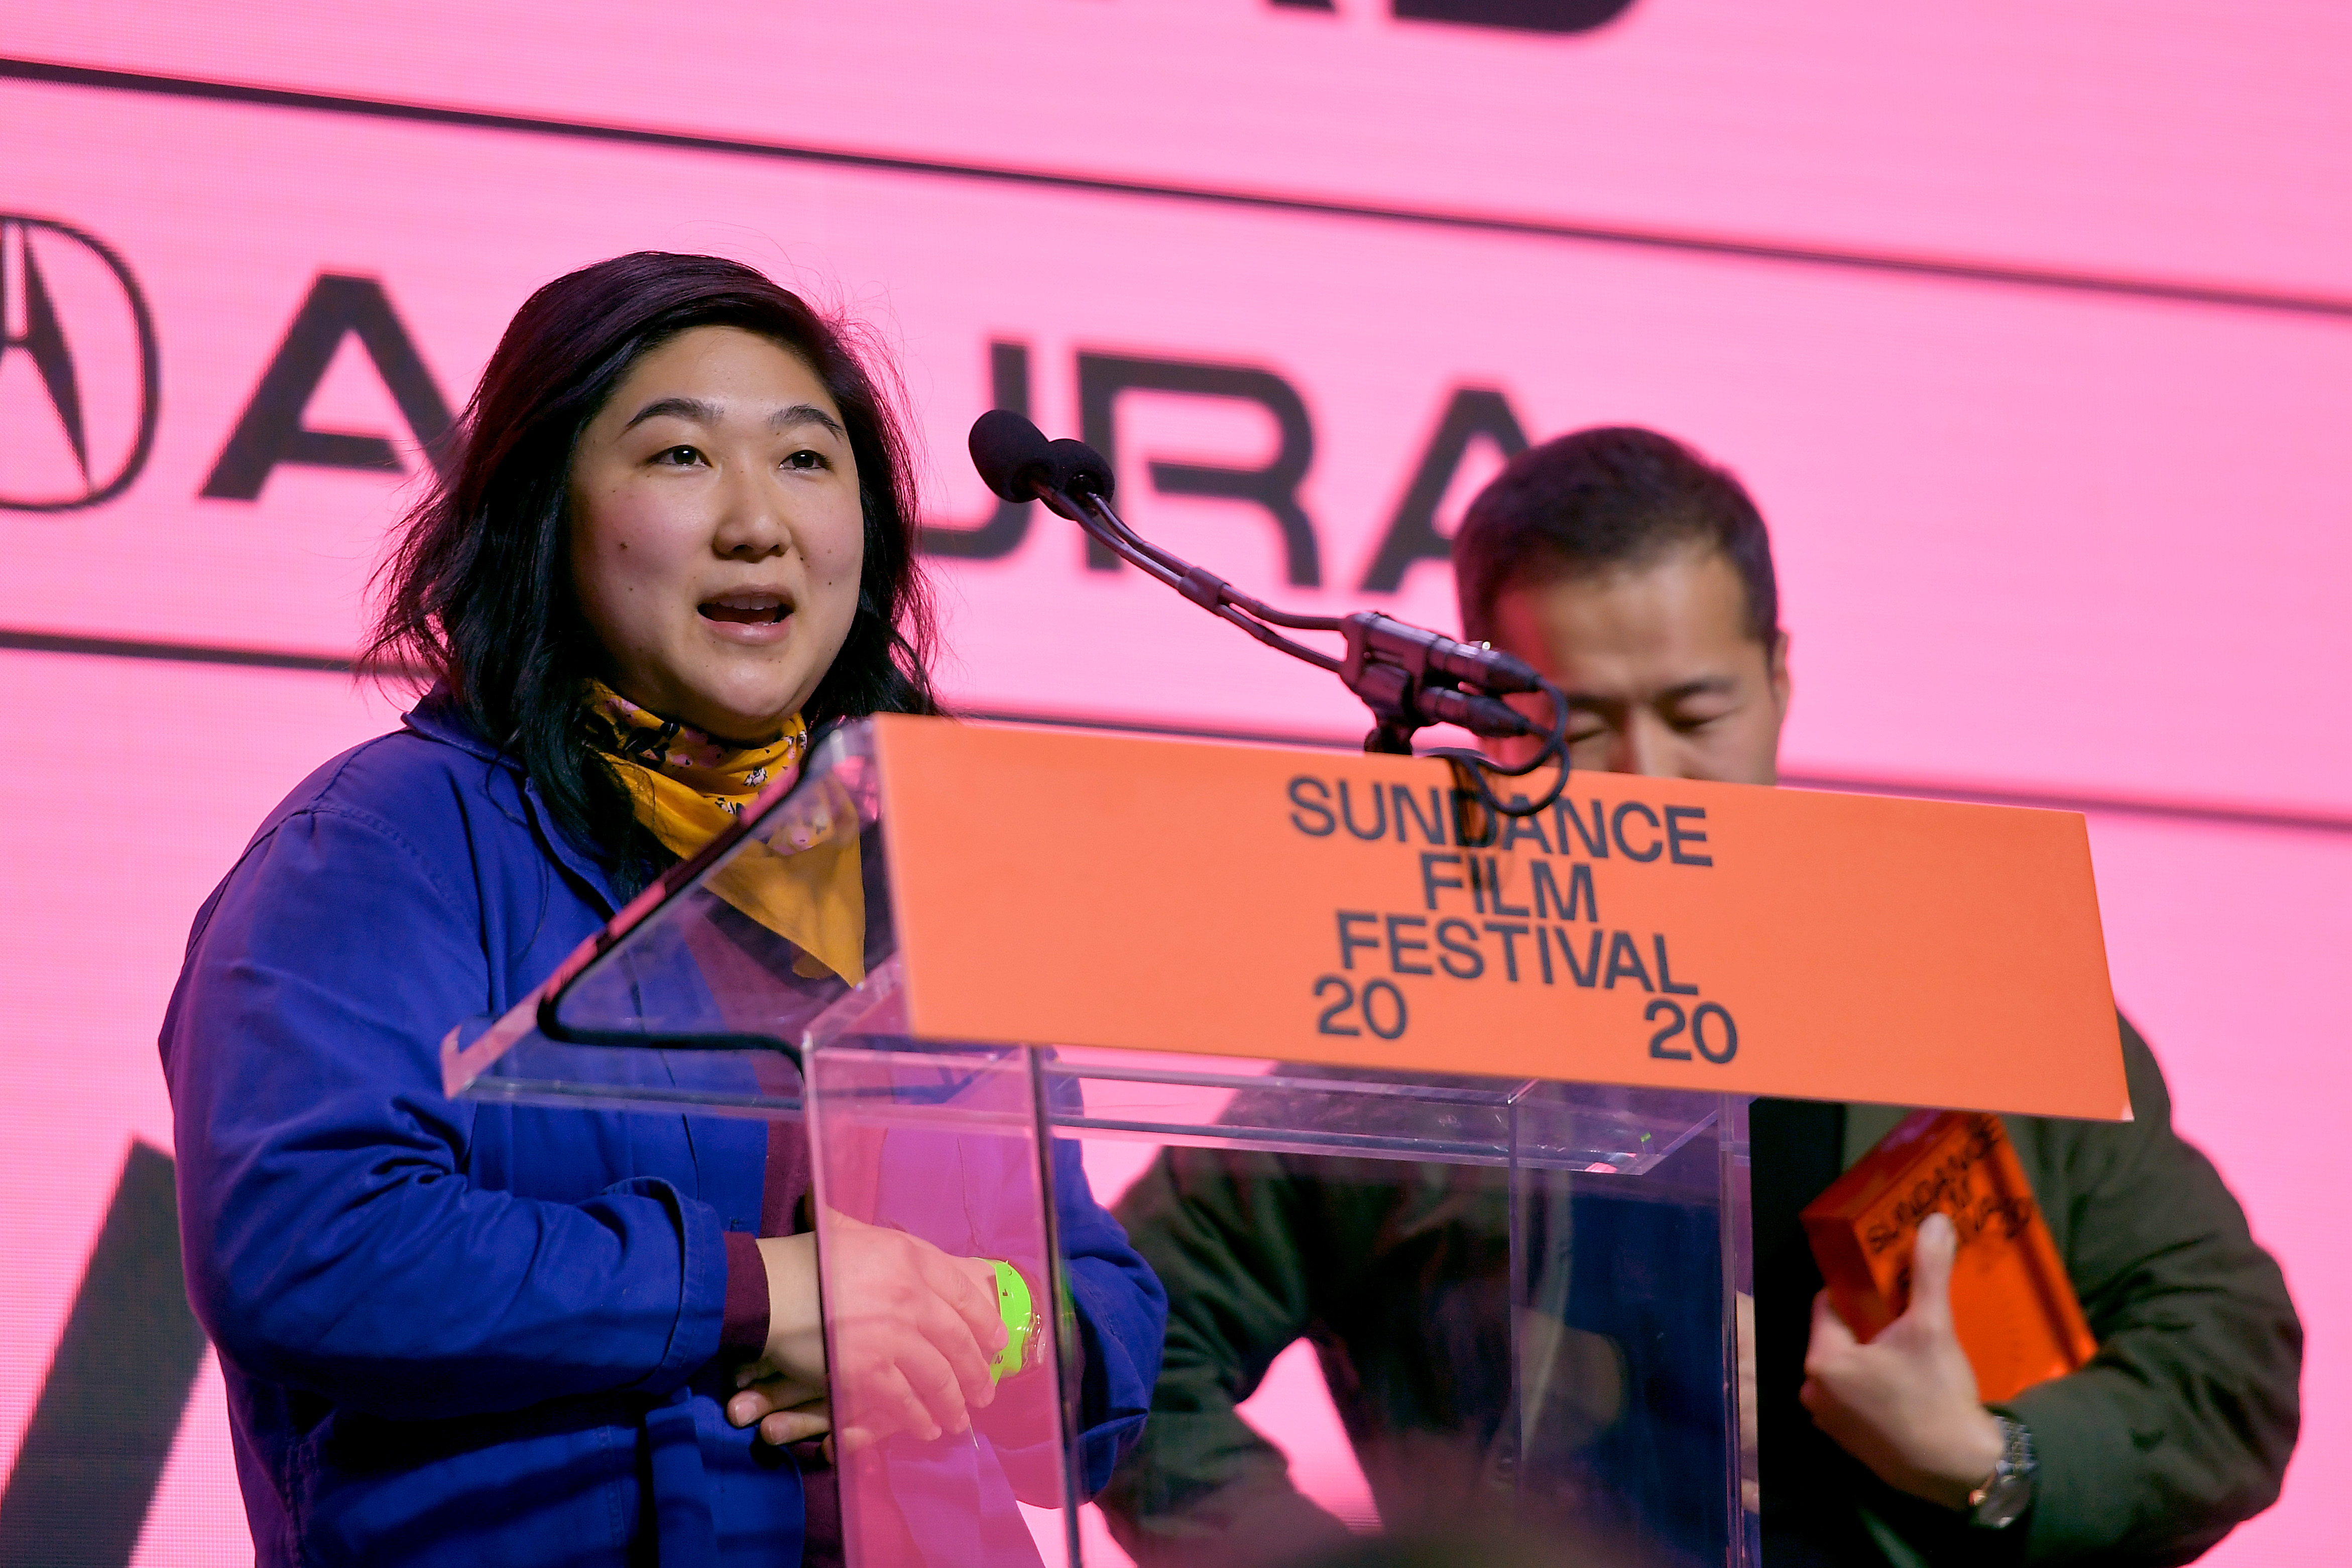 Christina Oh at the 2020 Sundance Film Festival Awards Night Ceremony